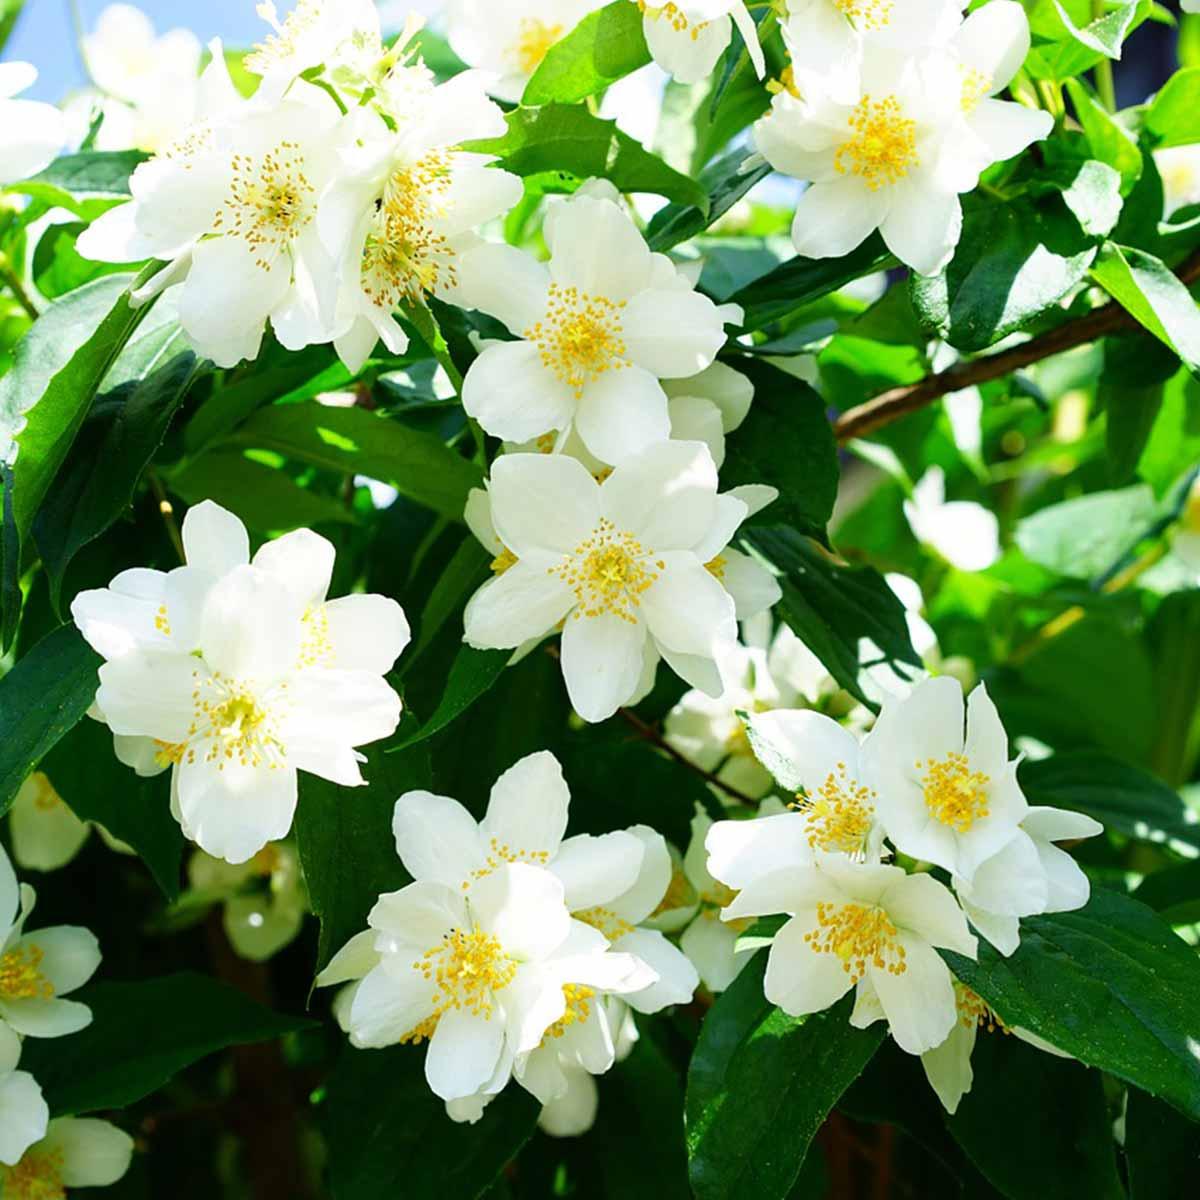 Mejores plantas para San Valentín - Jazmín